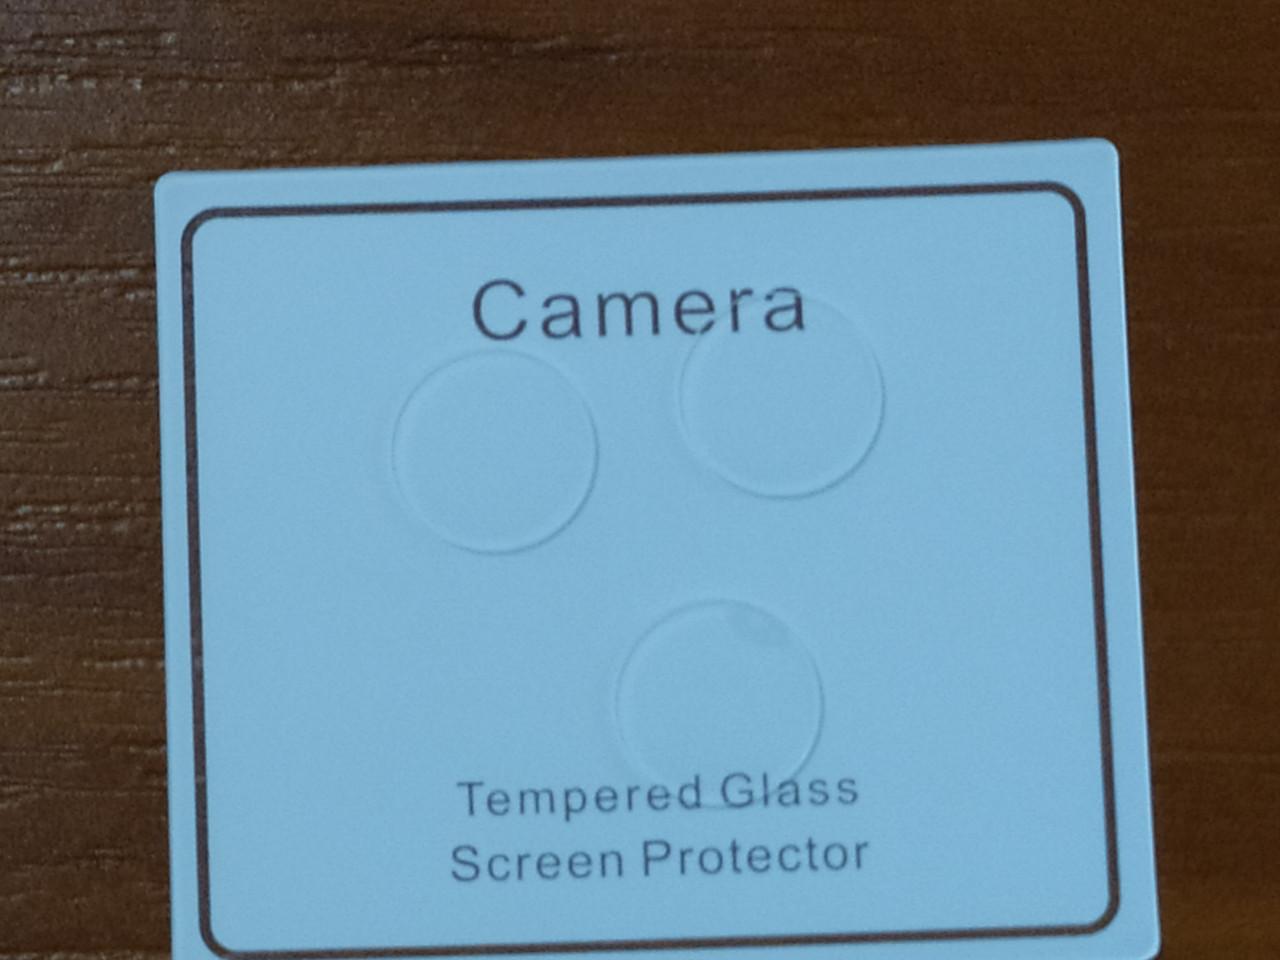 Защитное стекло на камеру Tempered Glass Screen Protector    iPhone 11 Pro   2019